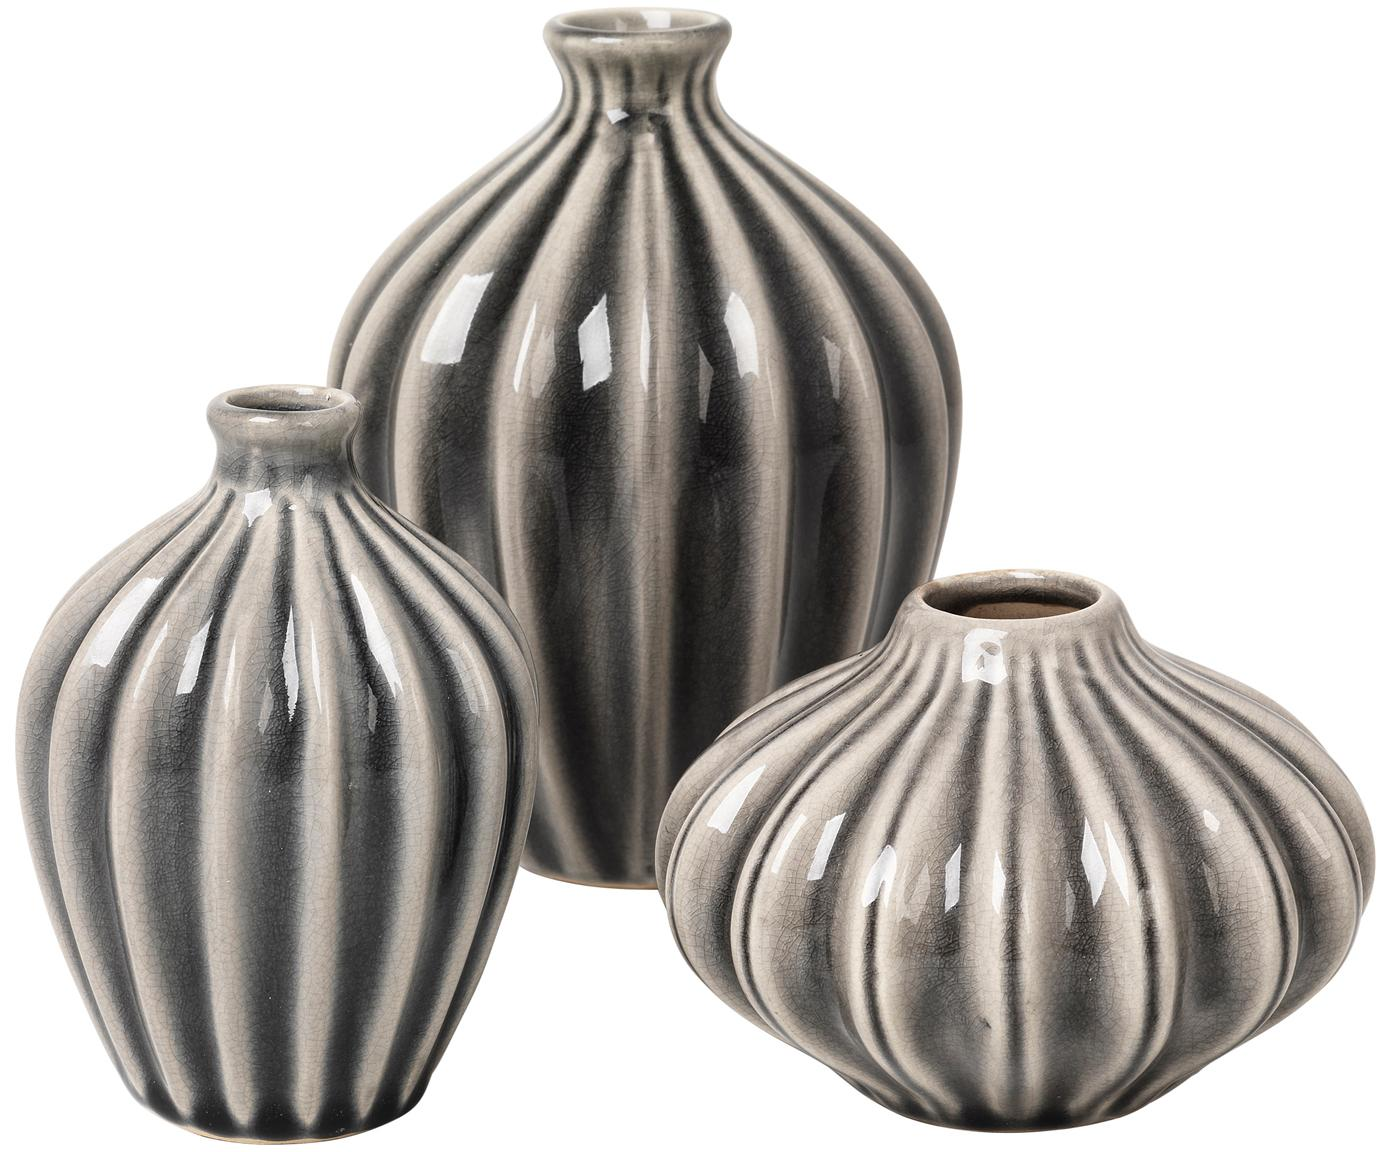 Set de jarrones de cerámica Amalie, 3pzas., Cerámica, no impermeable, Gris, Tamaños diferentes